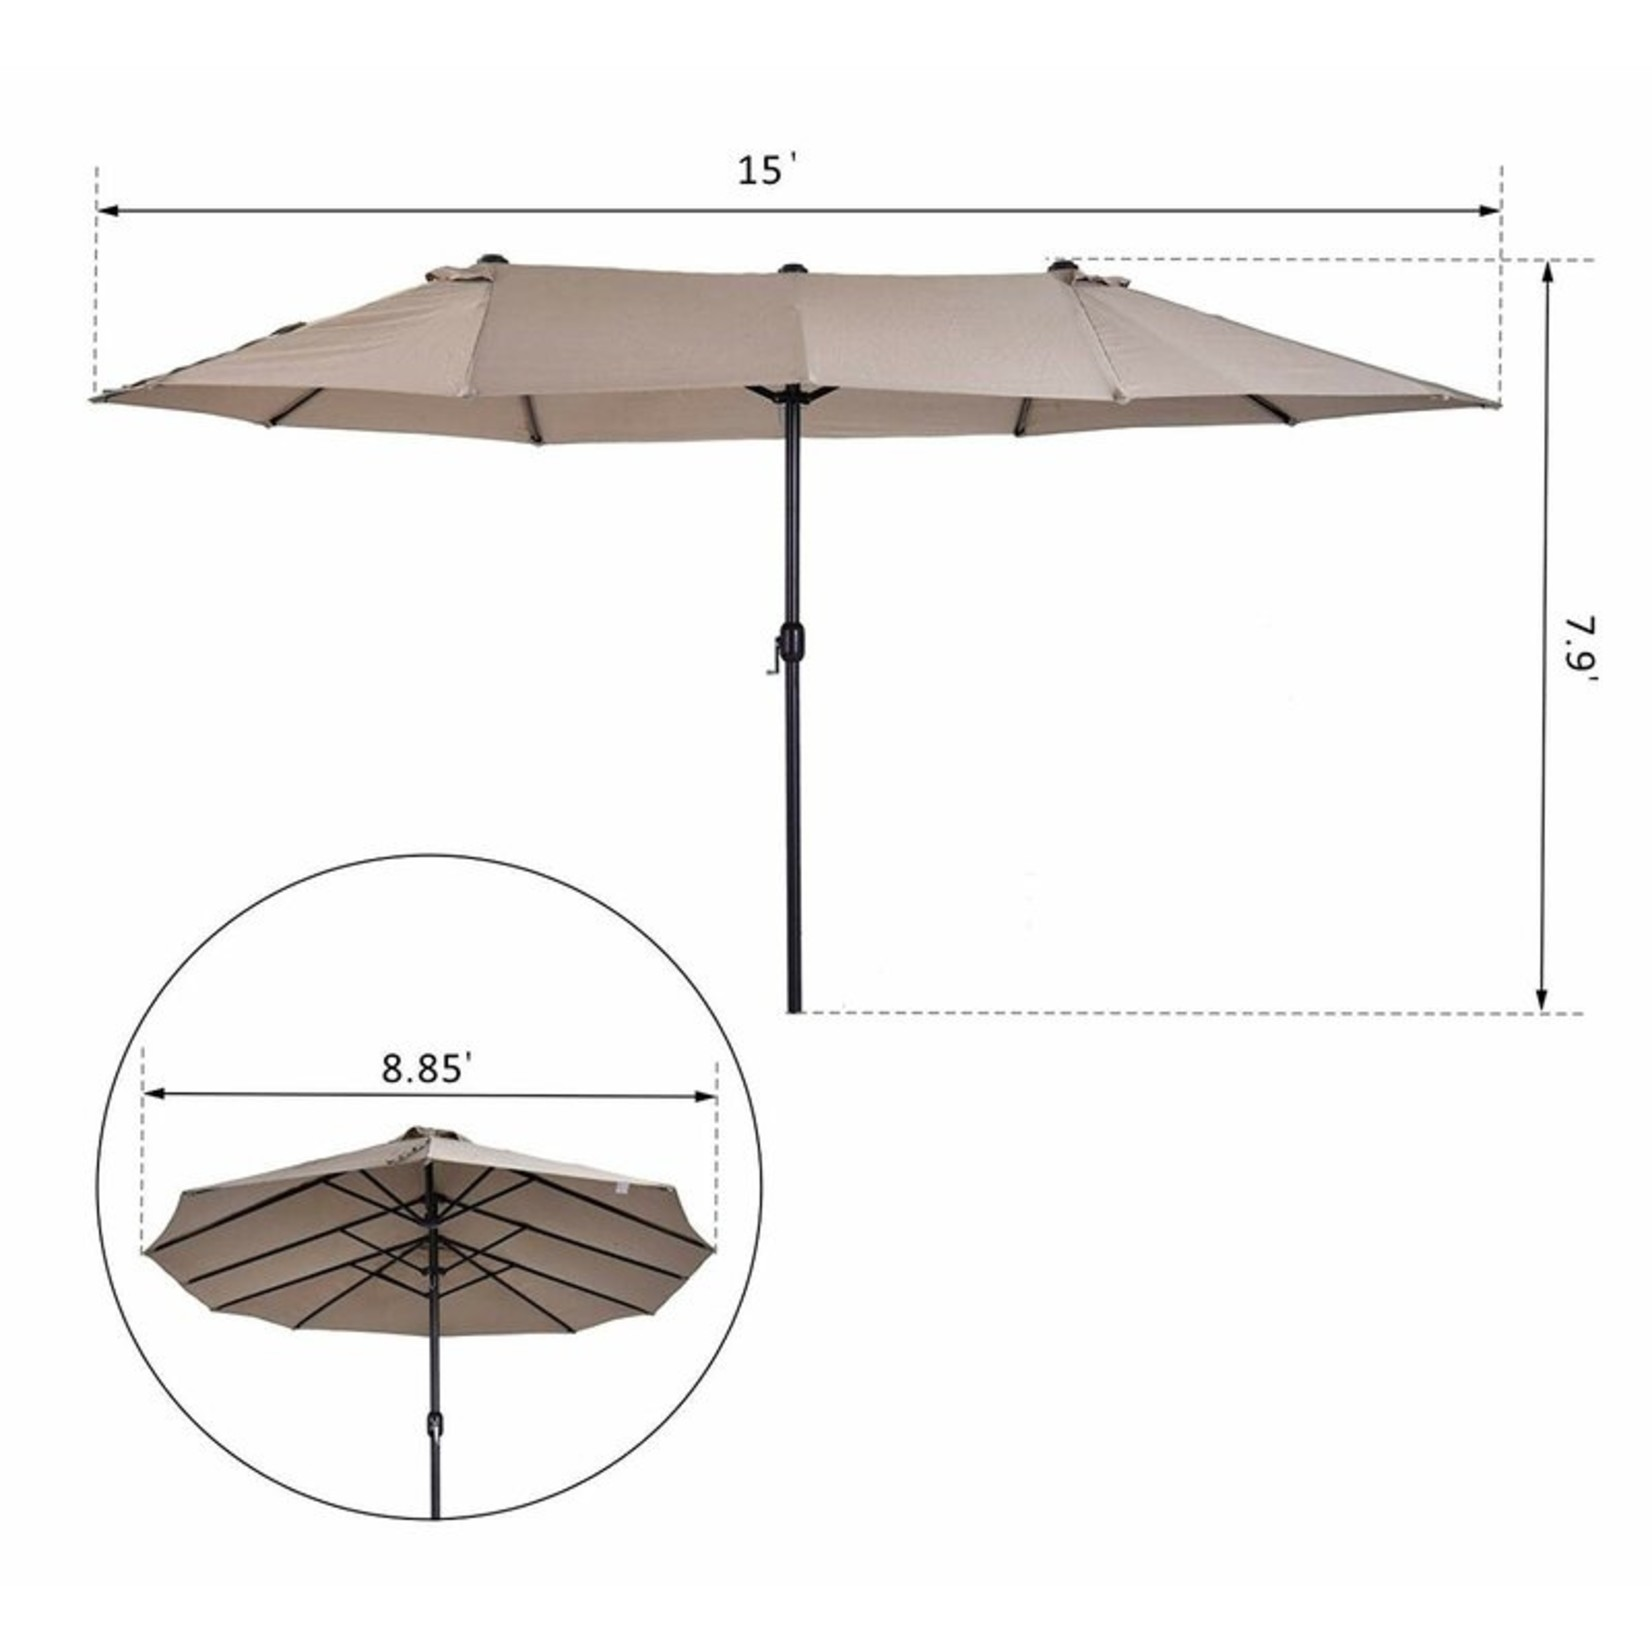 *Aniyah 9' x 15' Rectangular Umbrella - Coffee